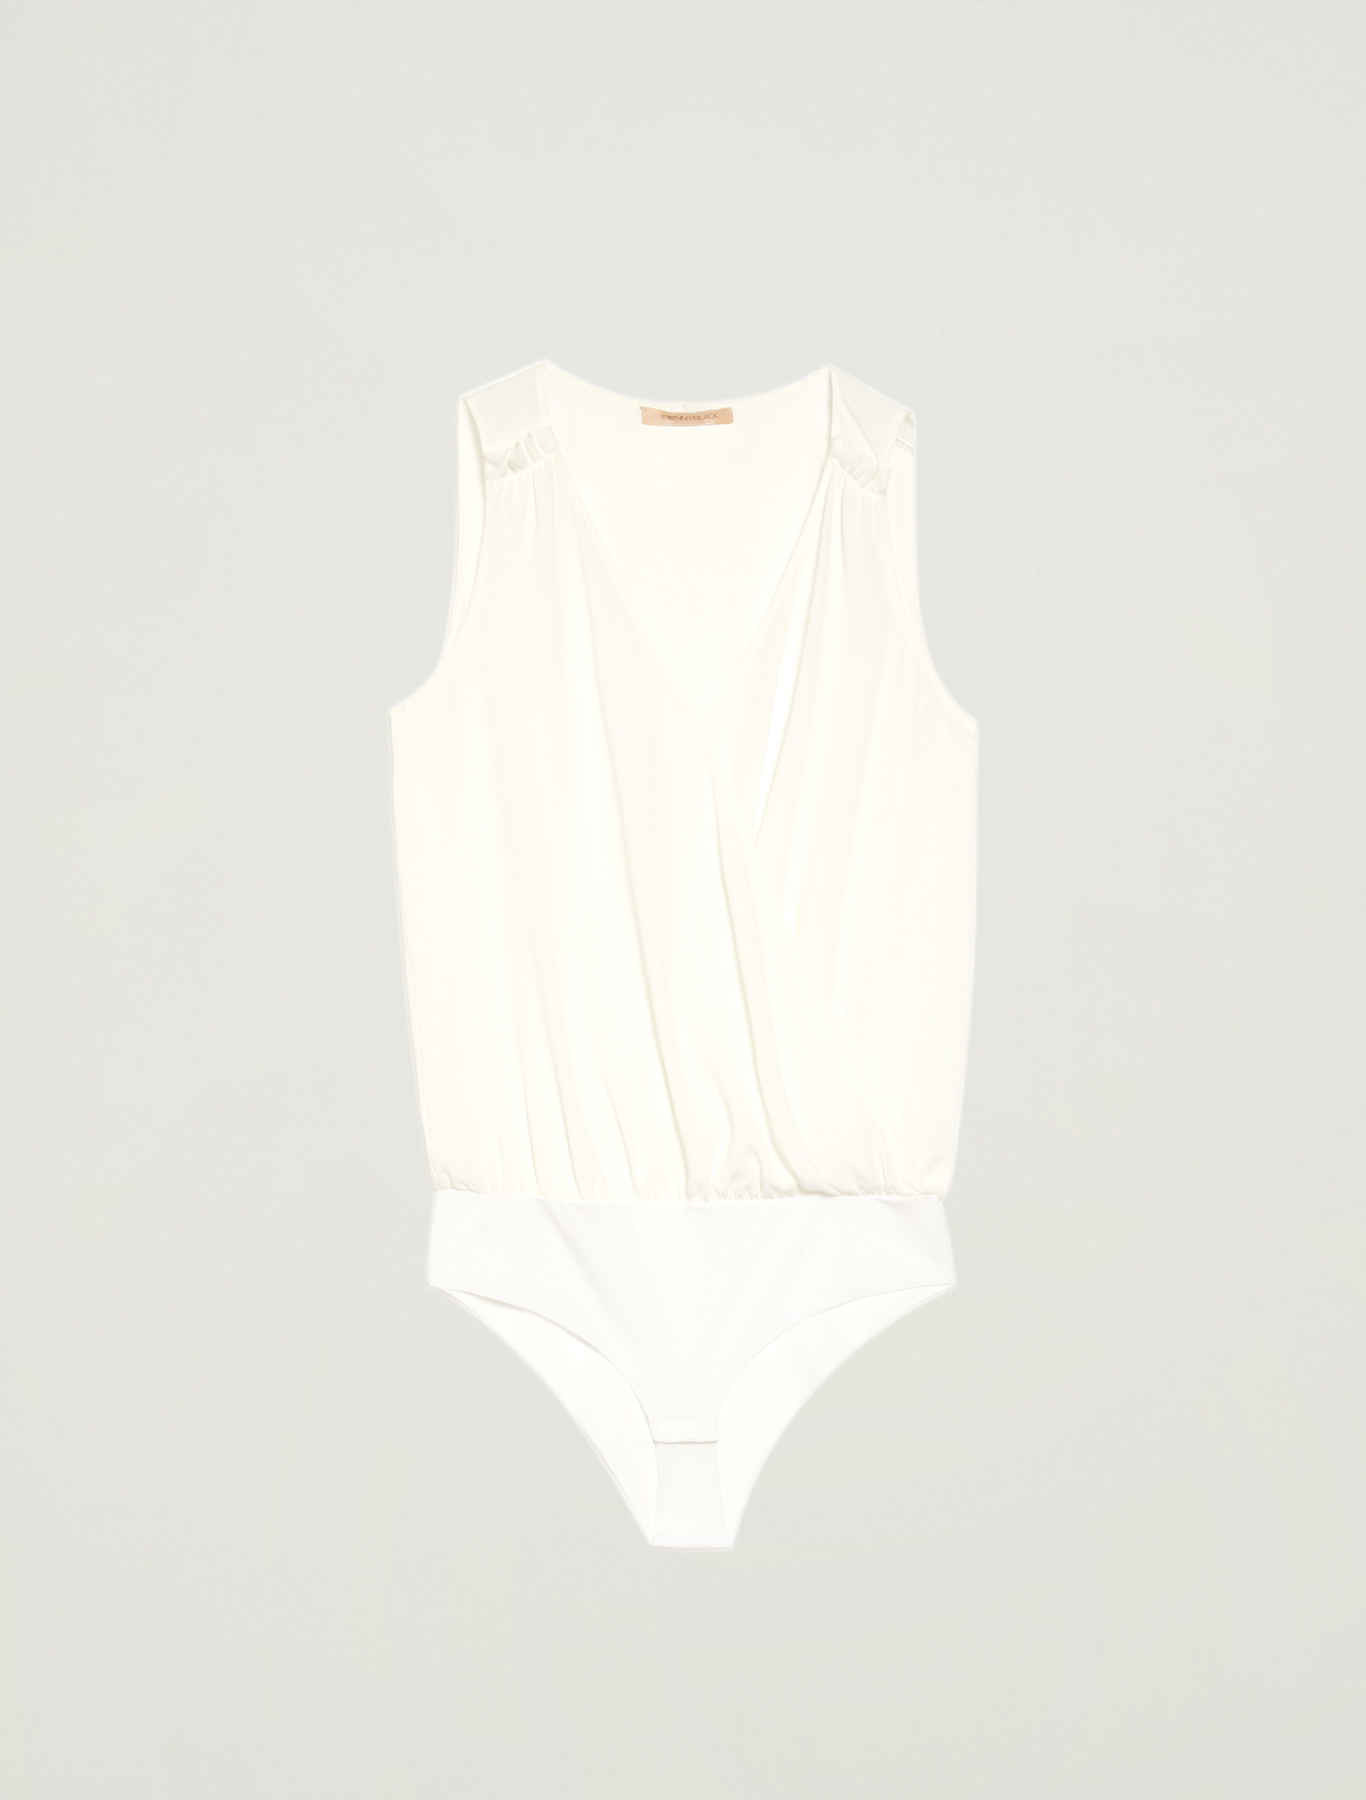 Crossover bodysuit - ivory - pennyblack